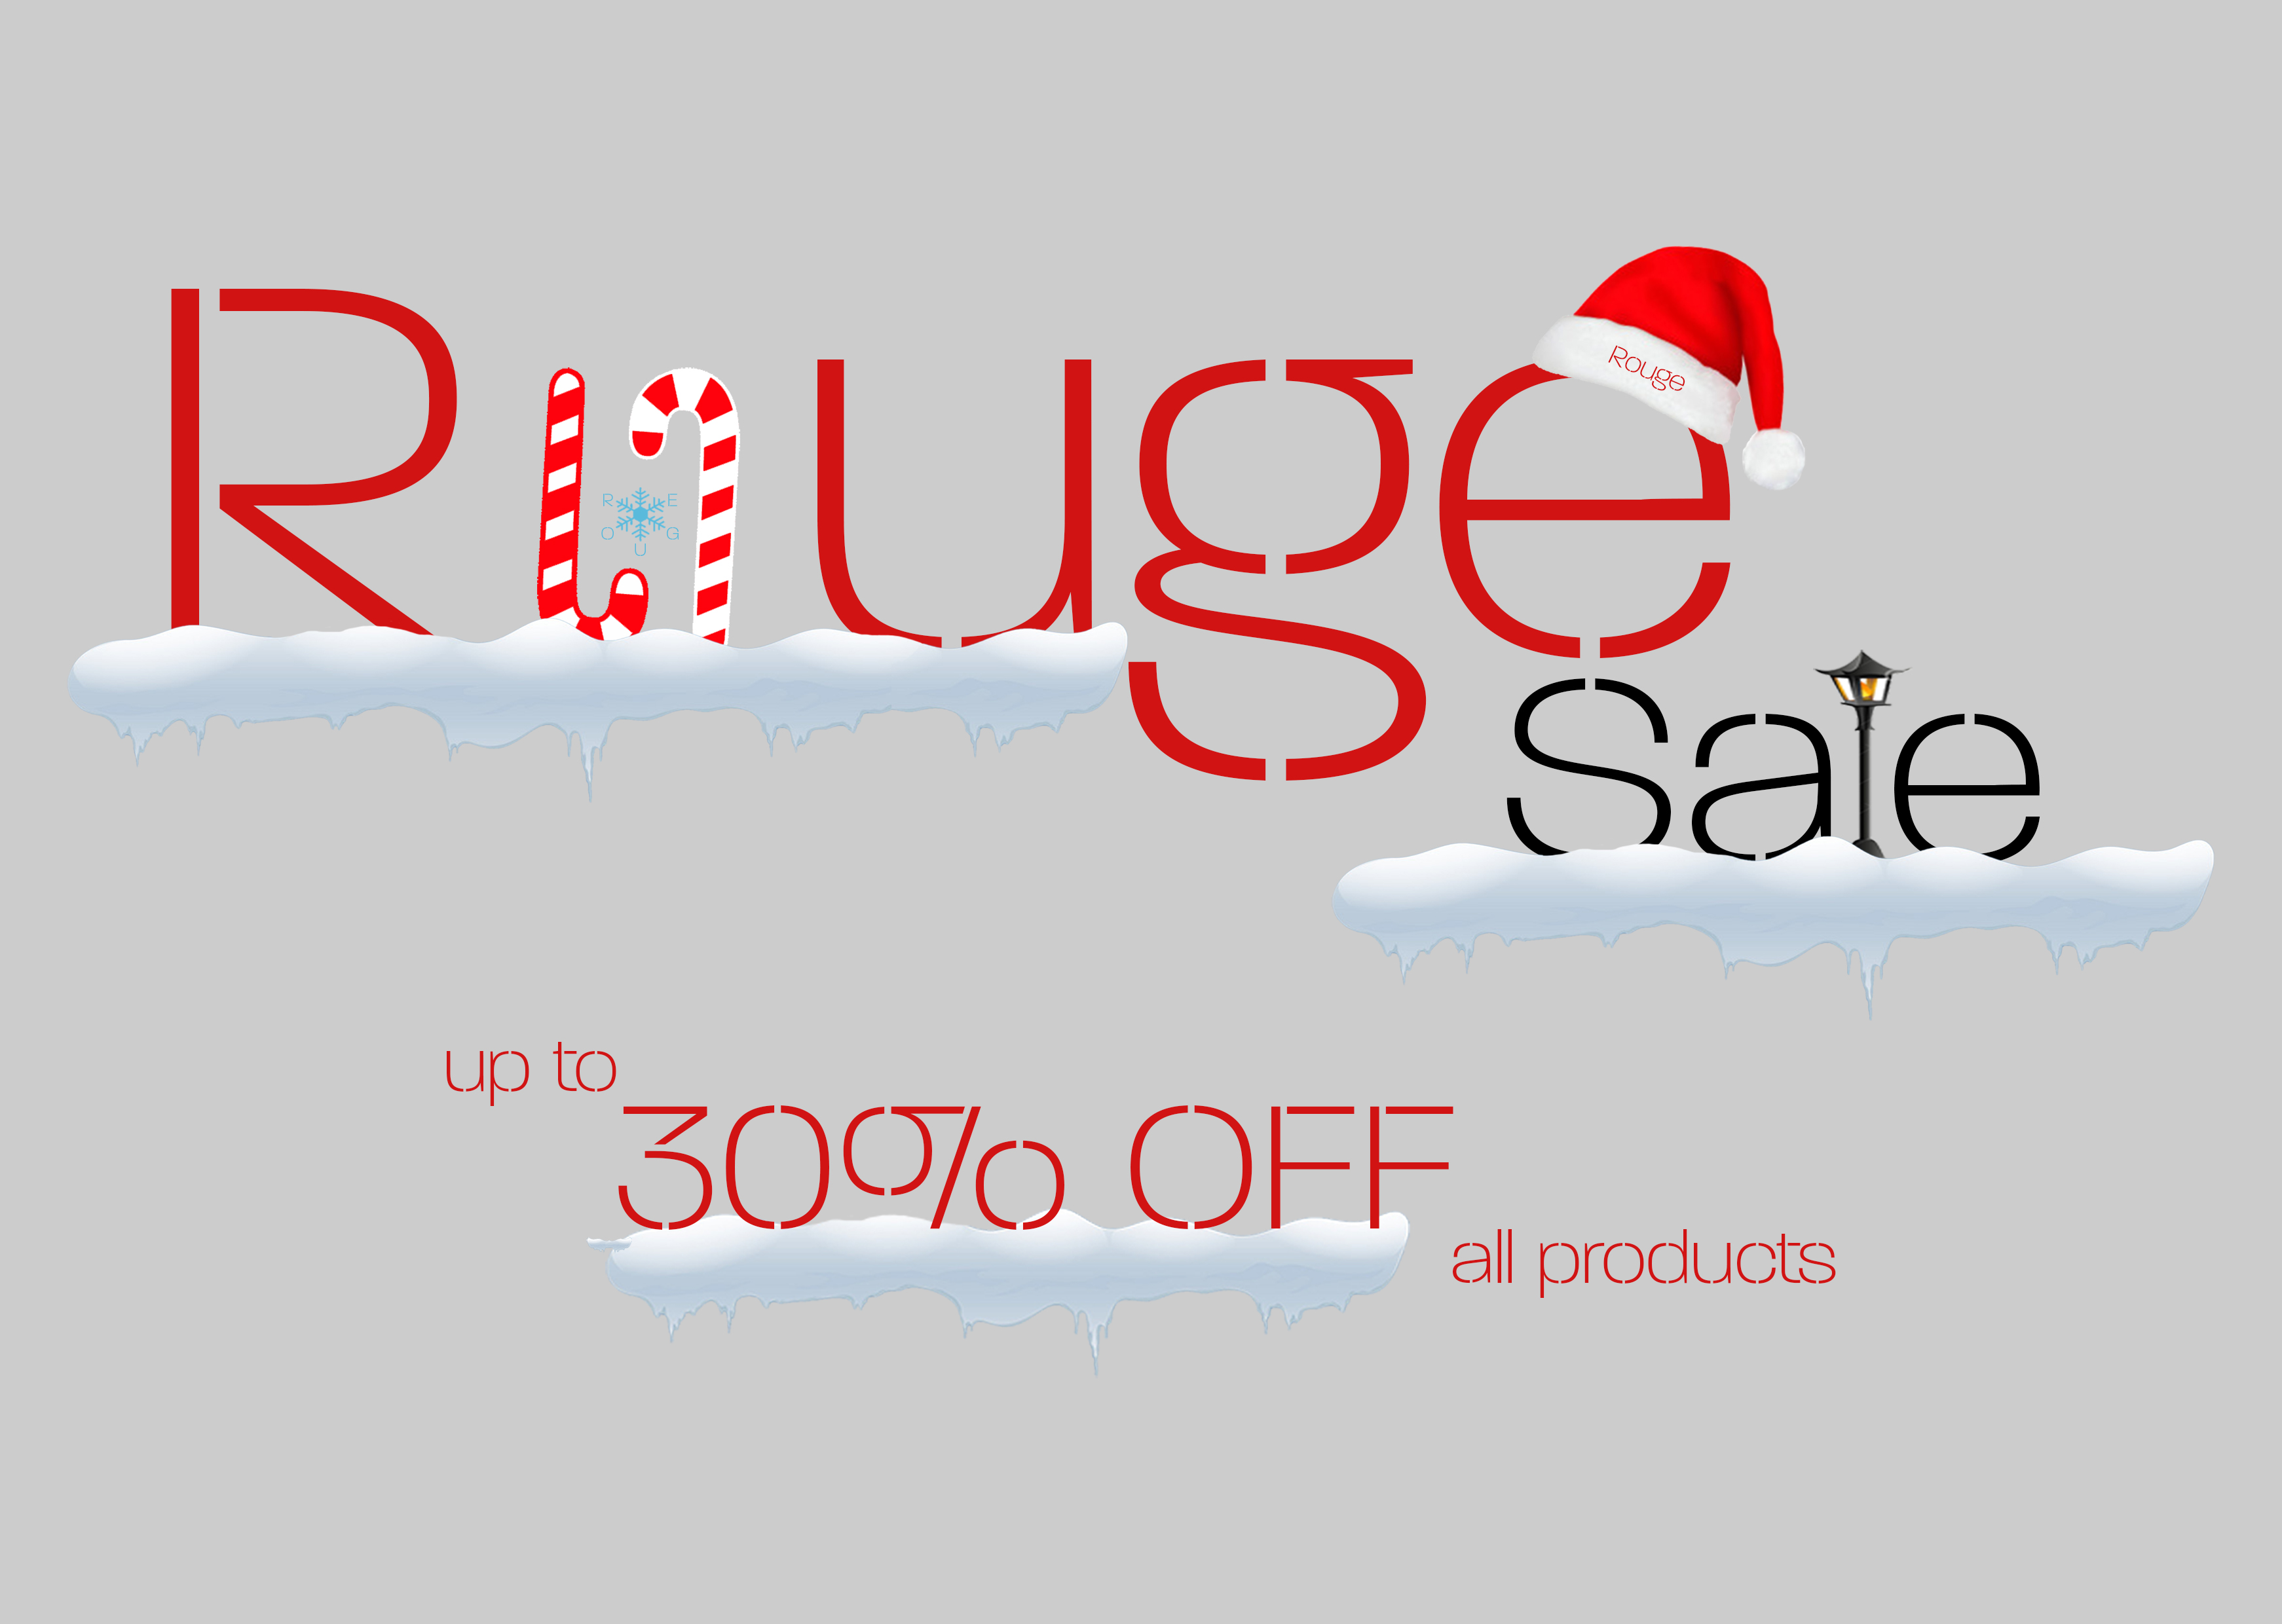 Rouge Sale logo